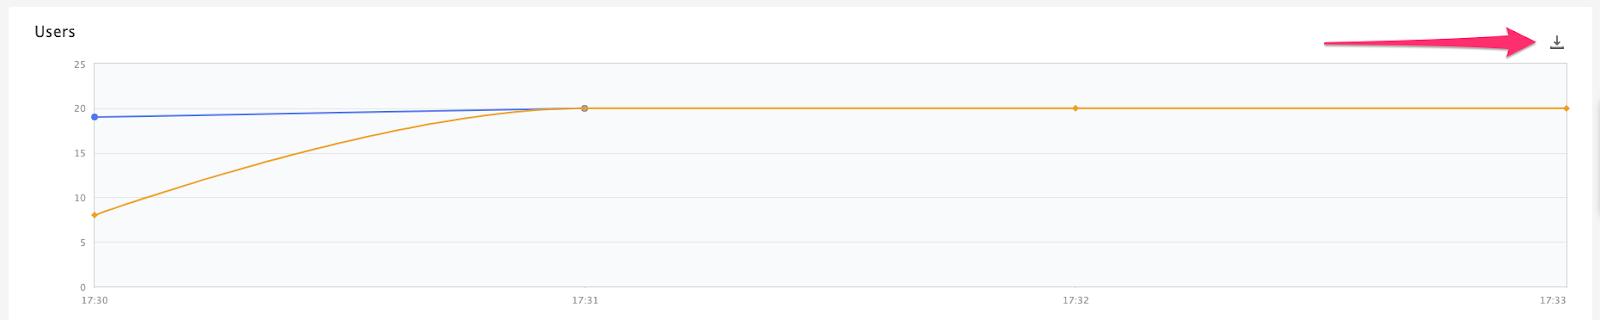 Export Comparison Reports to CSV Files